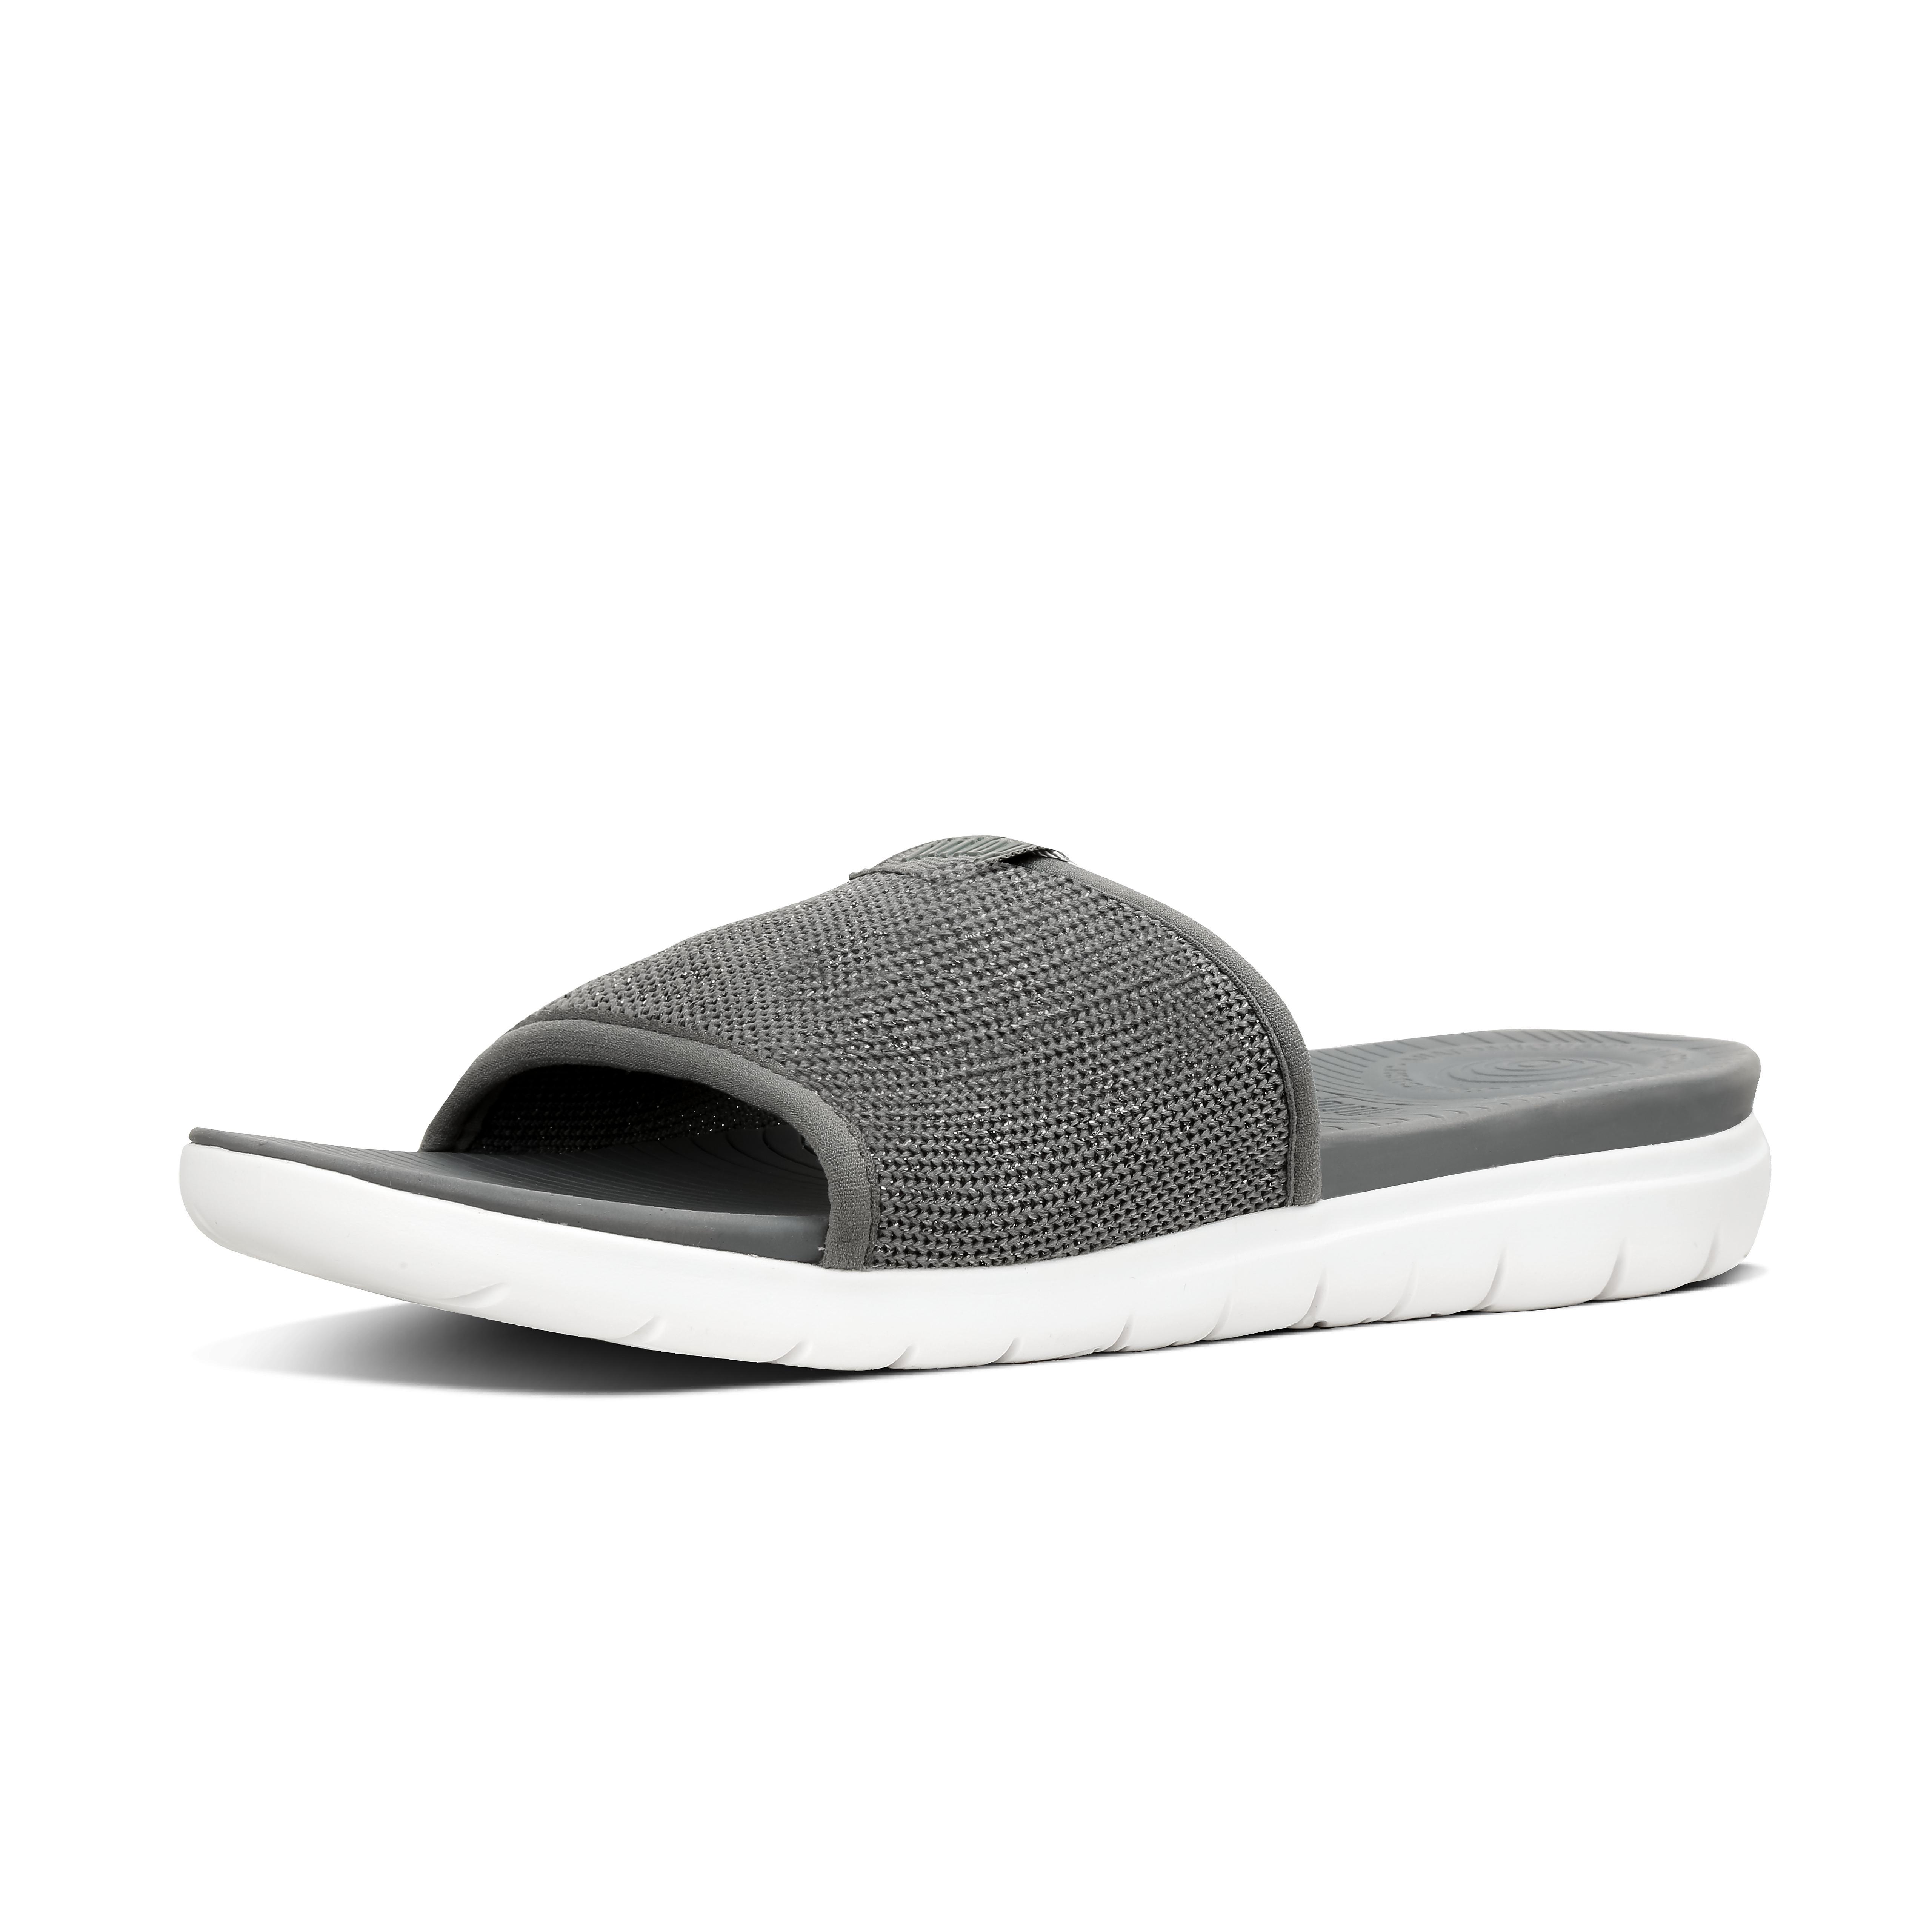 Uberknit slide sandals charcoal grey pewter m44 605